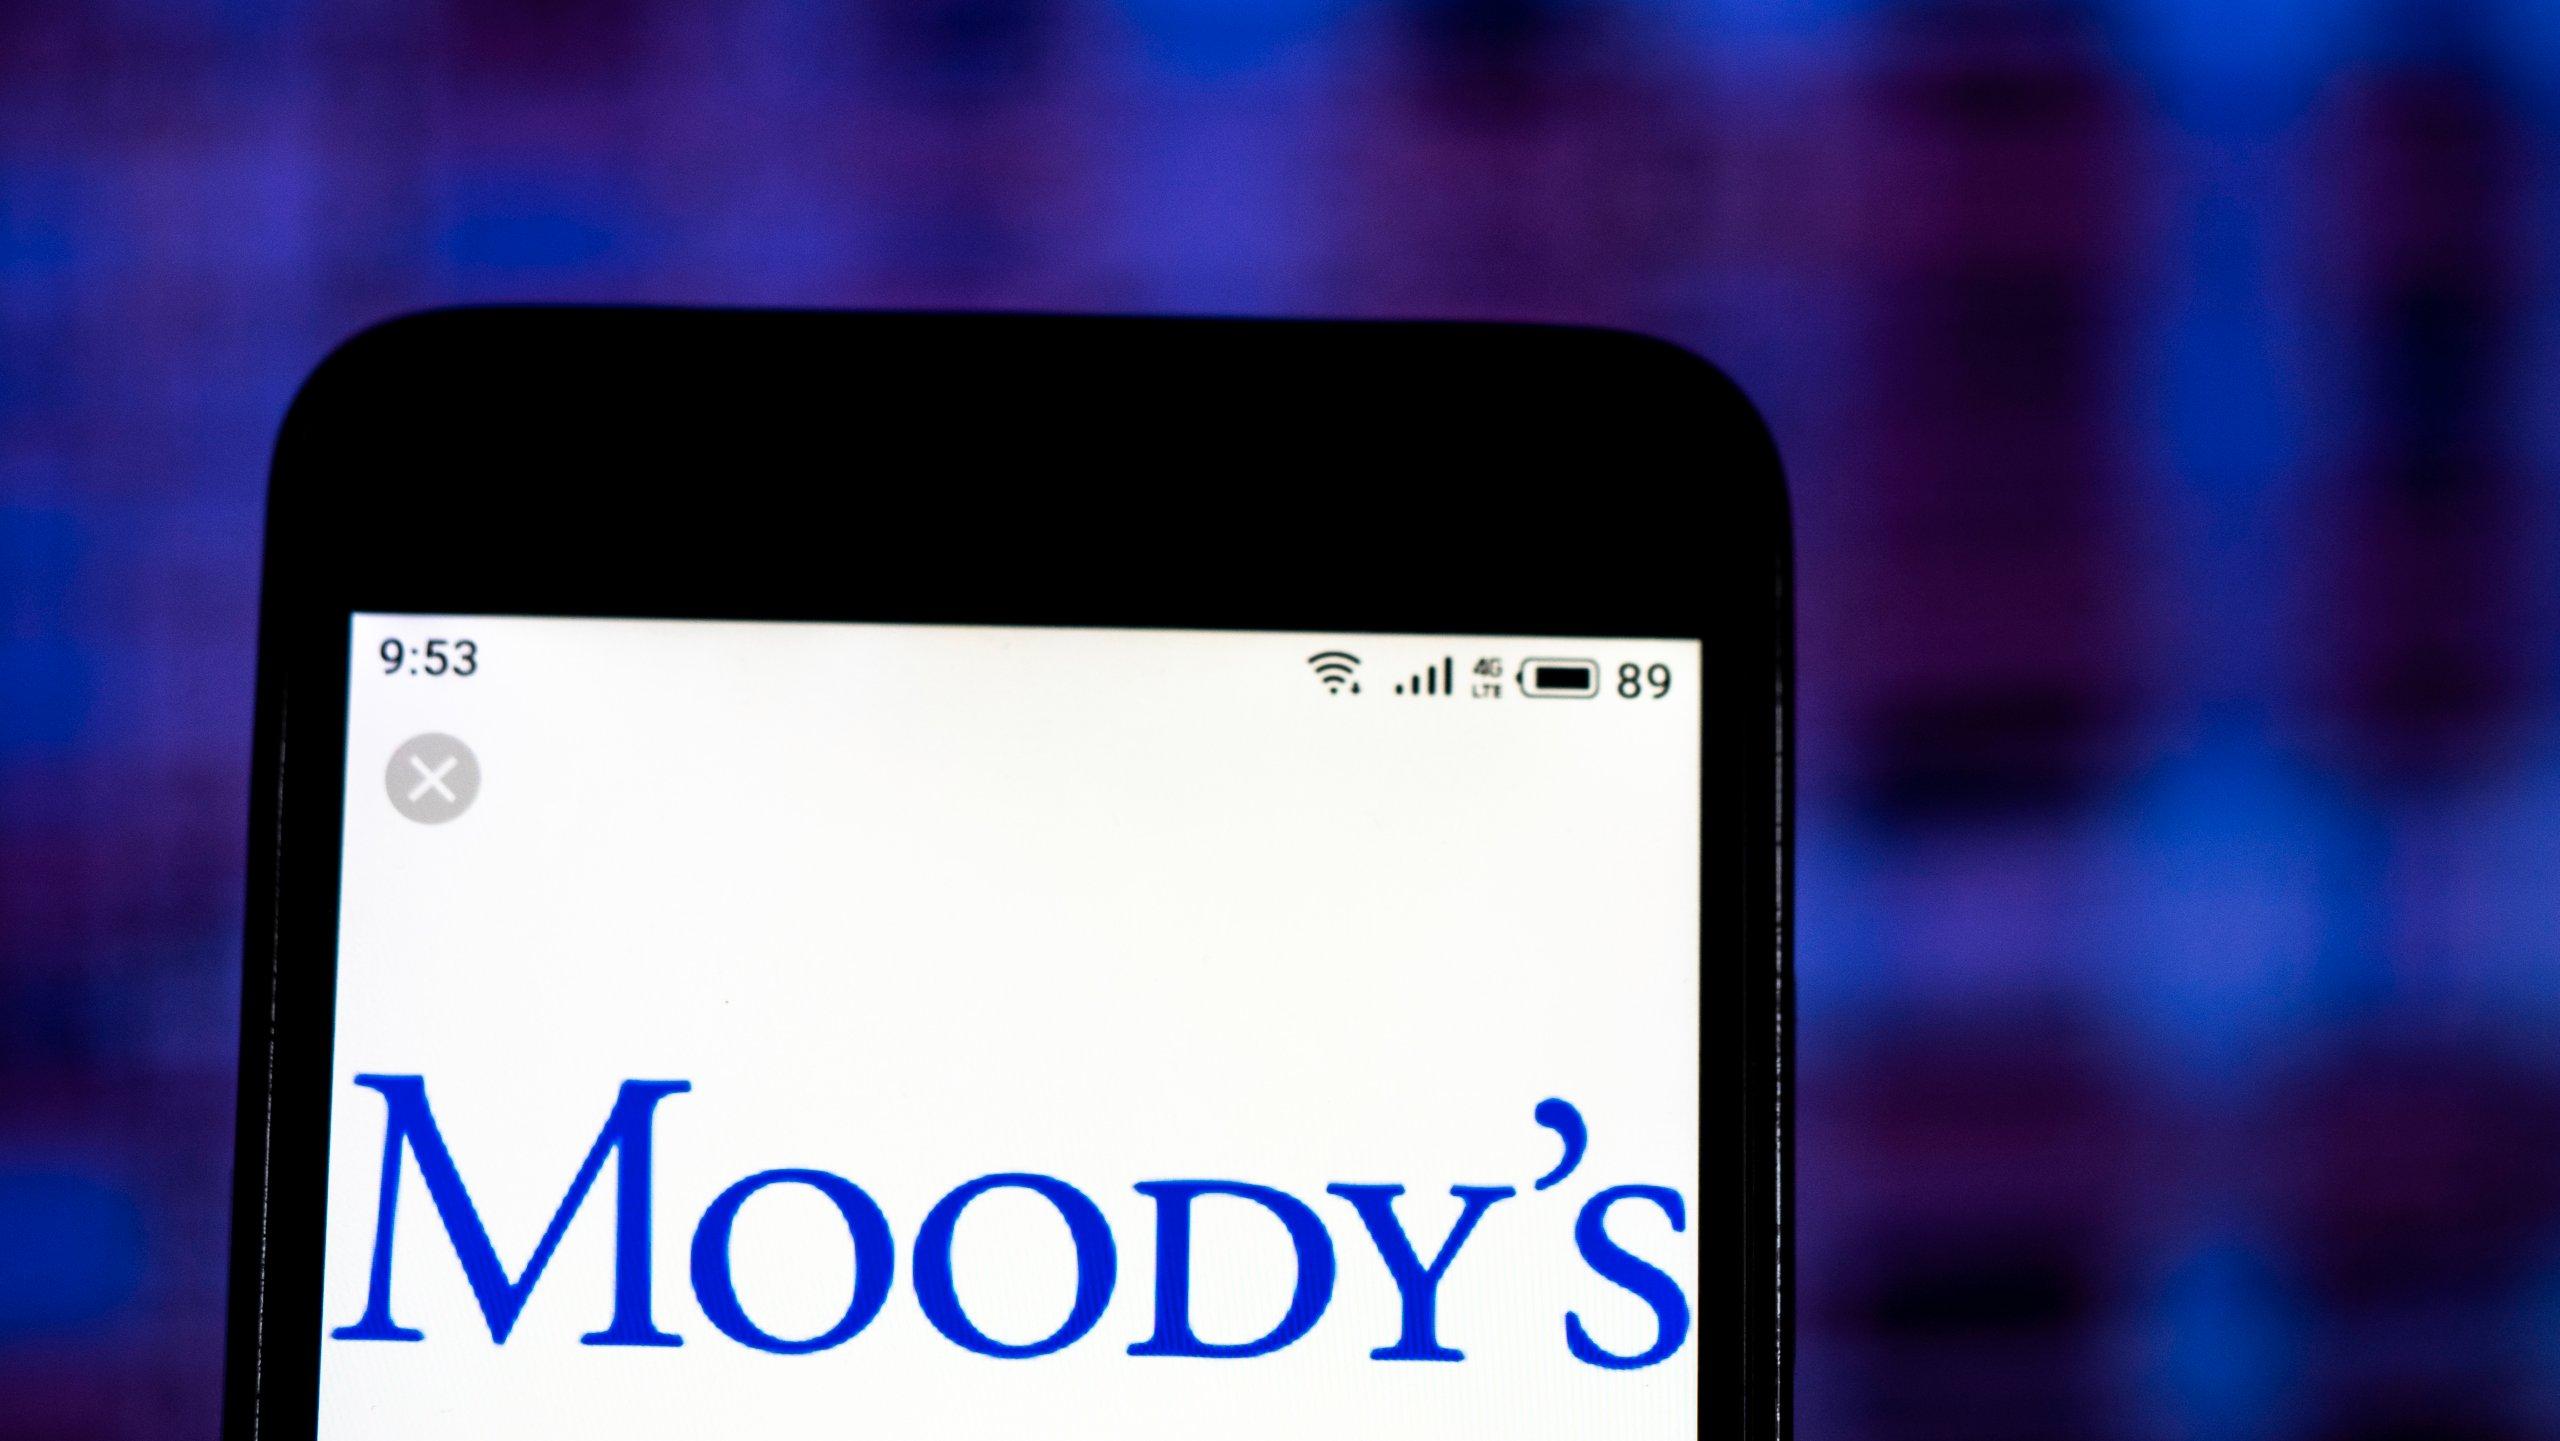 Moody's Corporation Financial services company logo seen